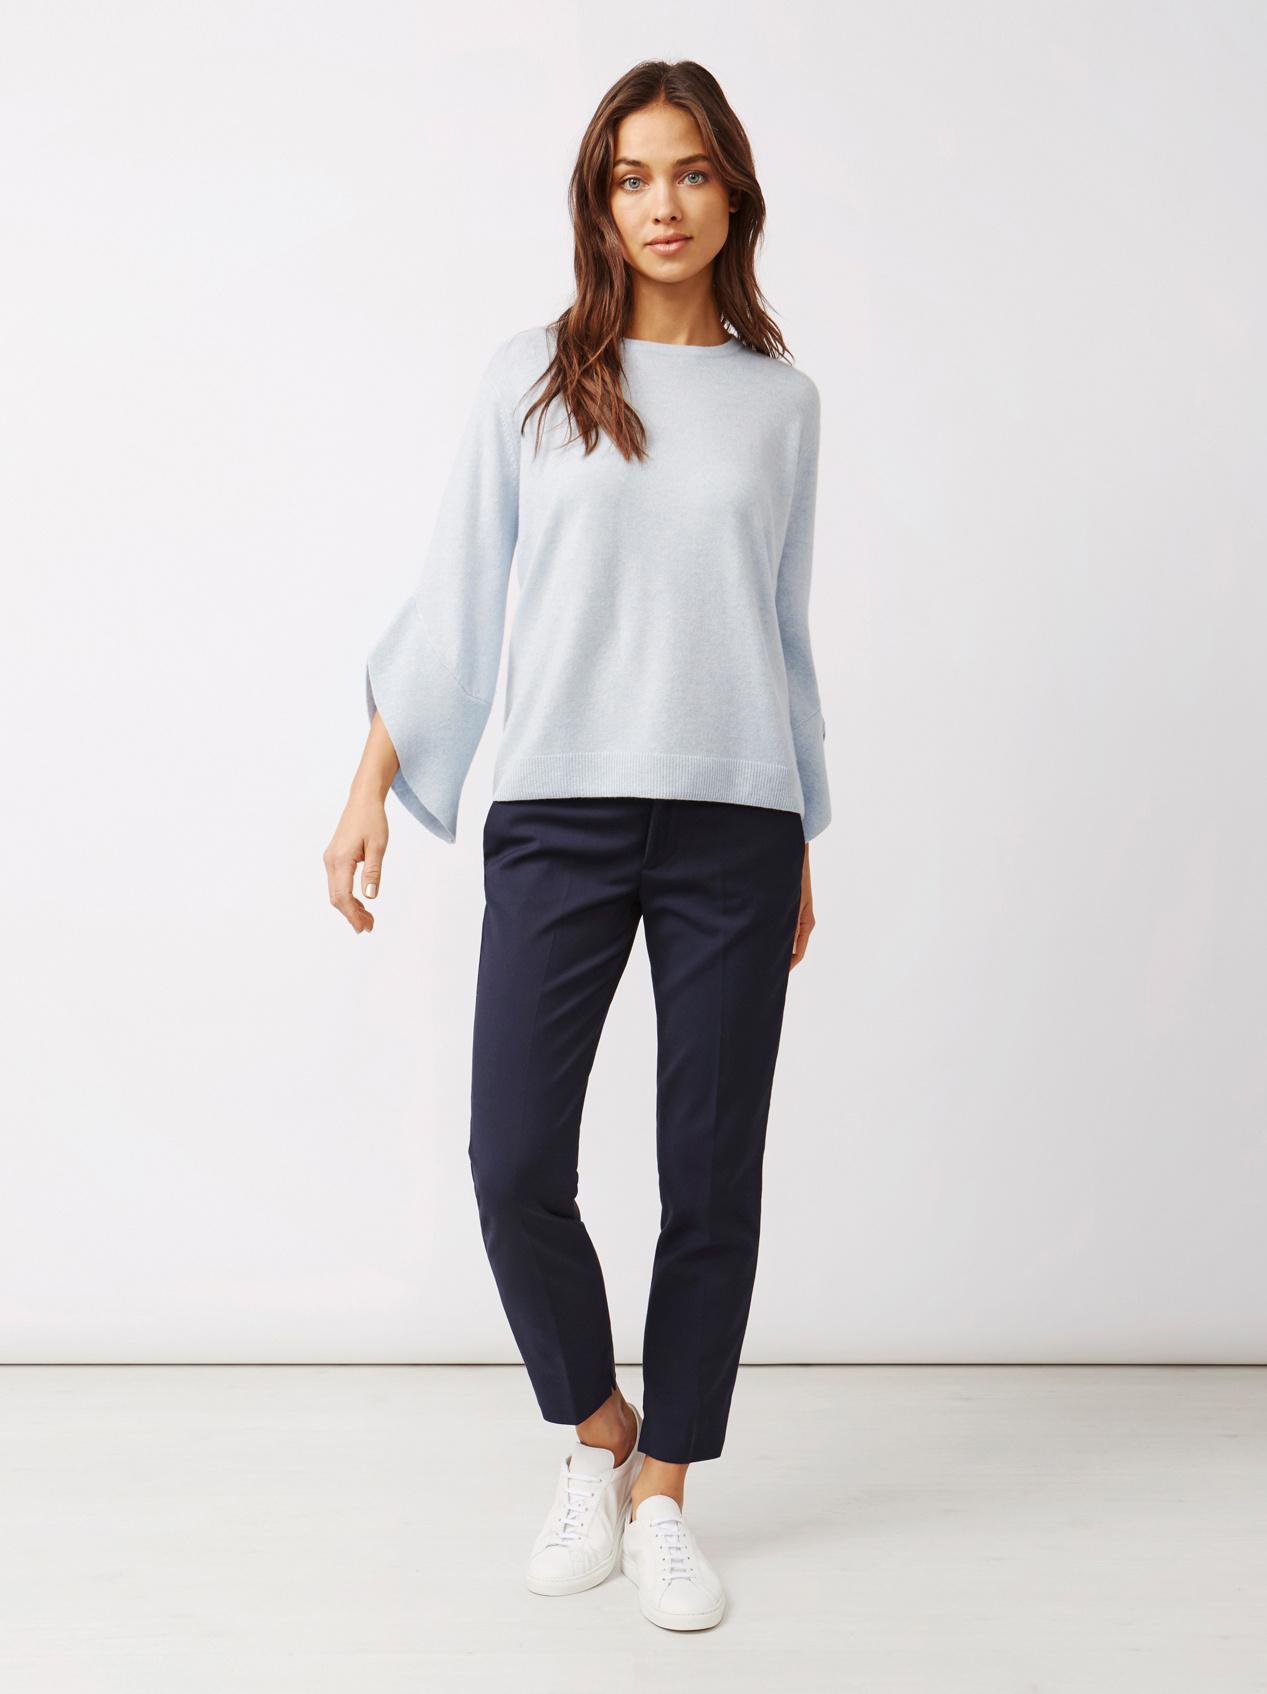 Soft Goat Women's Tulip Arm Sweater Light Blue